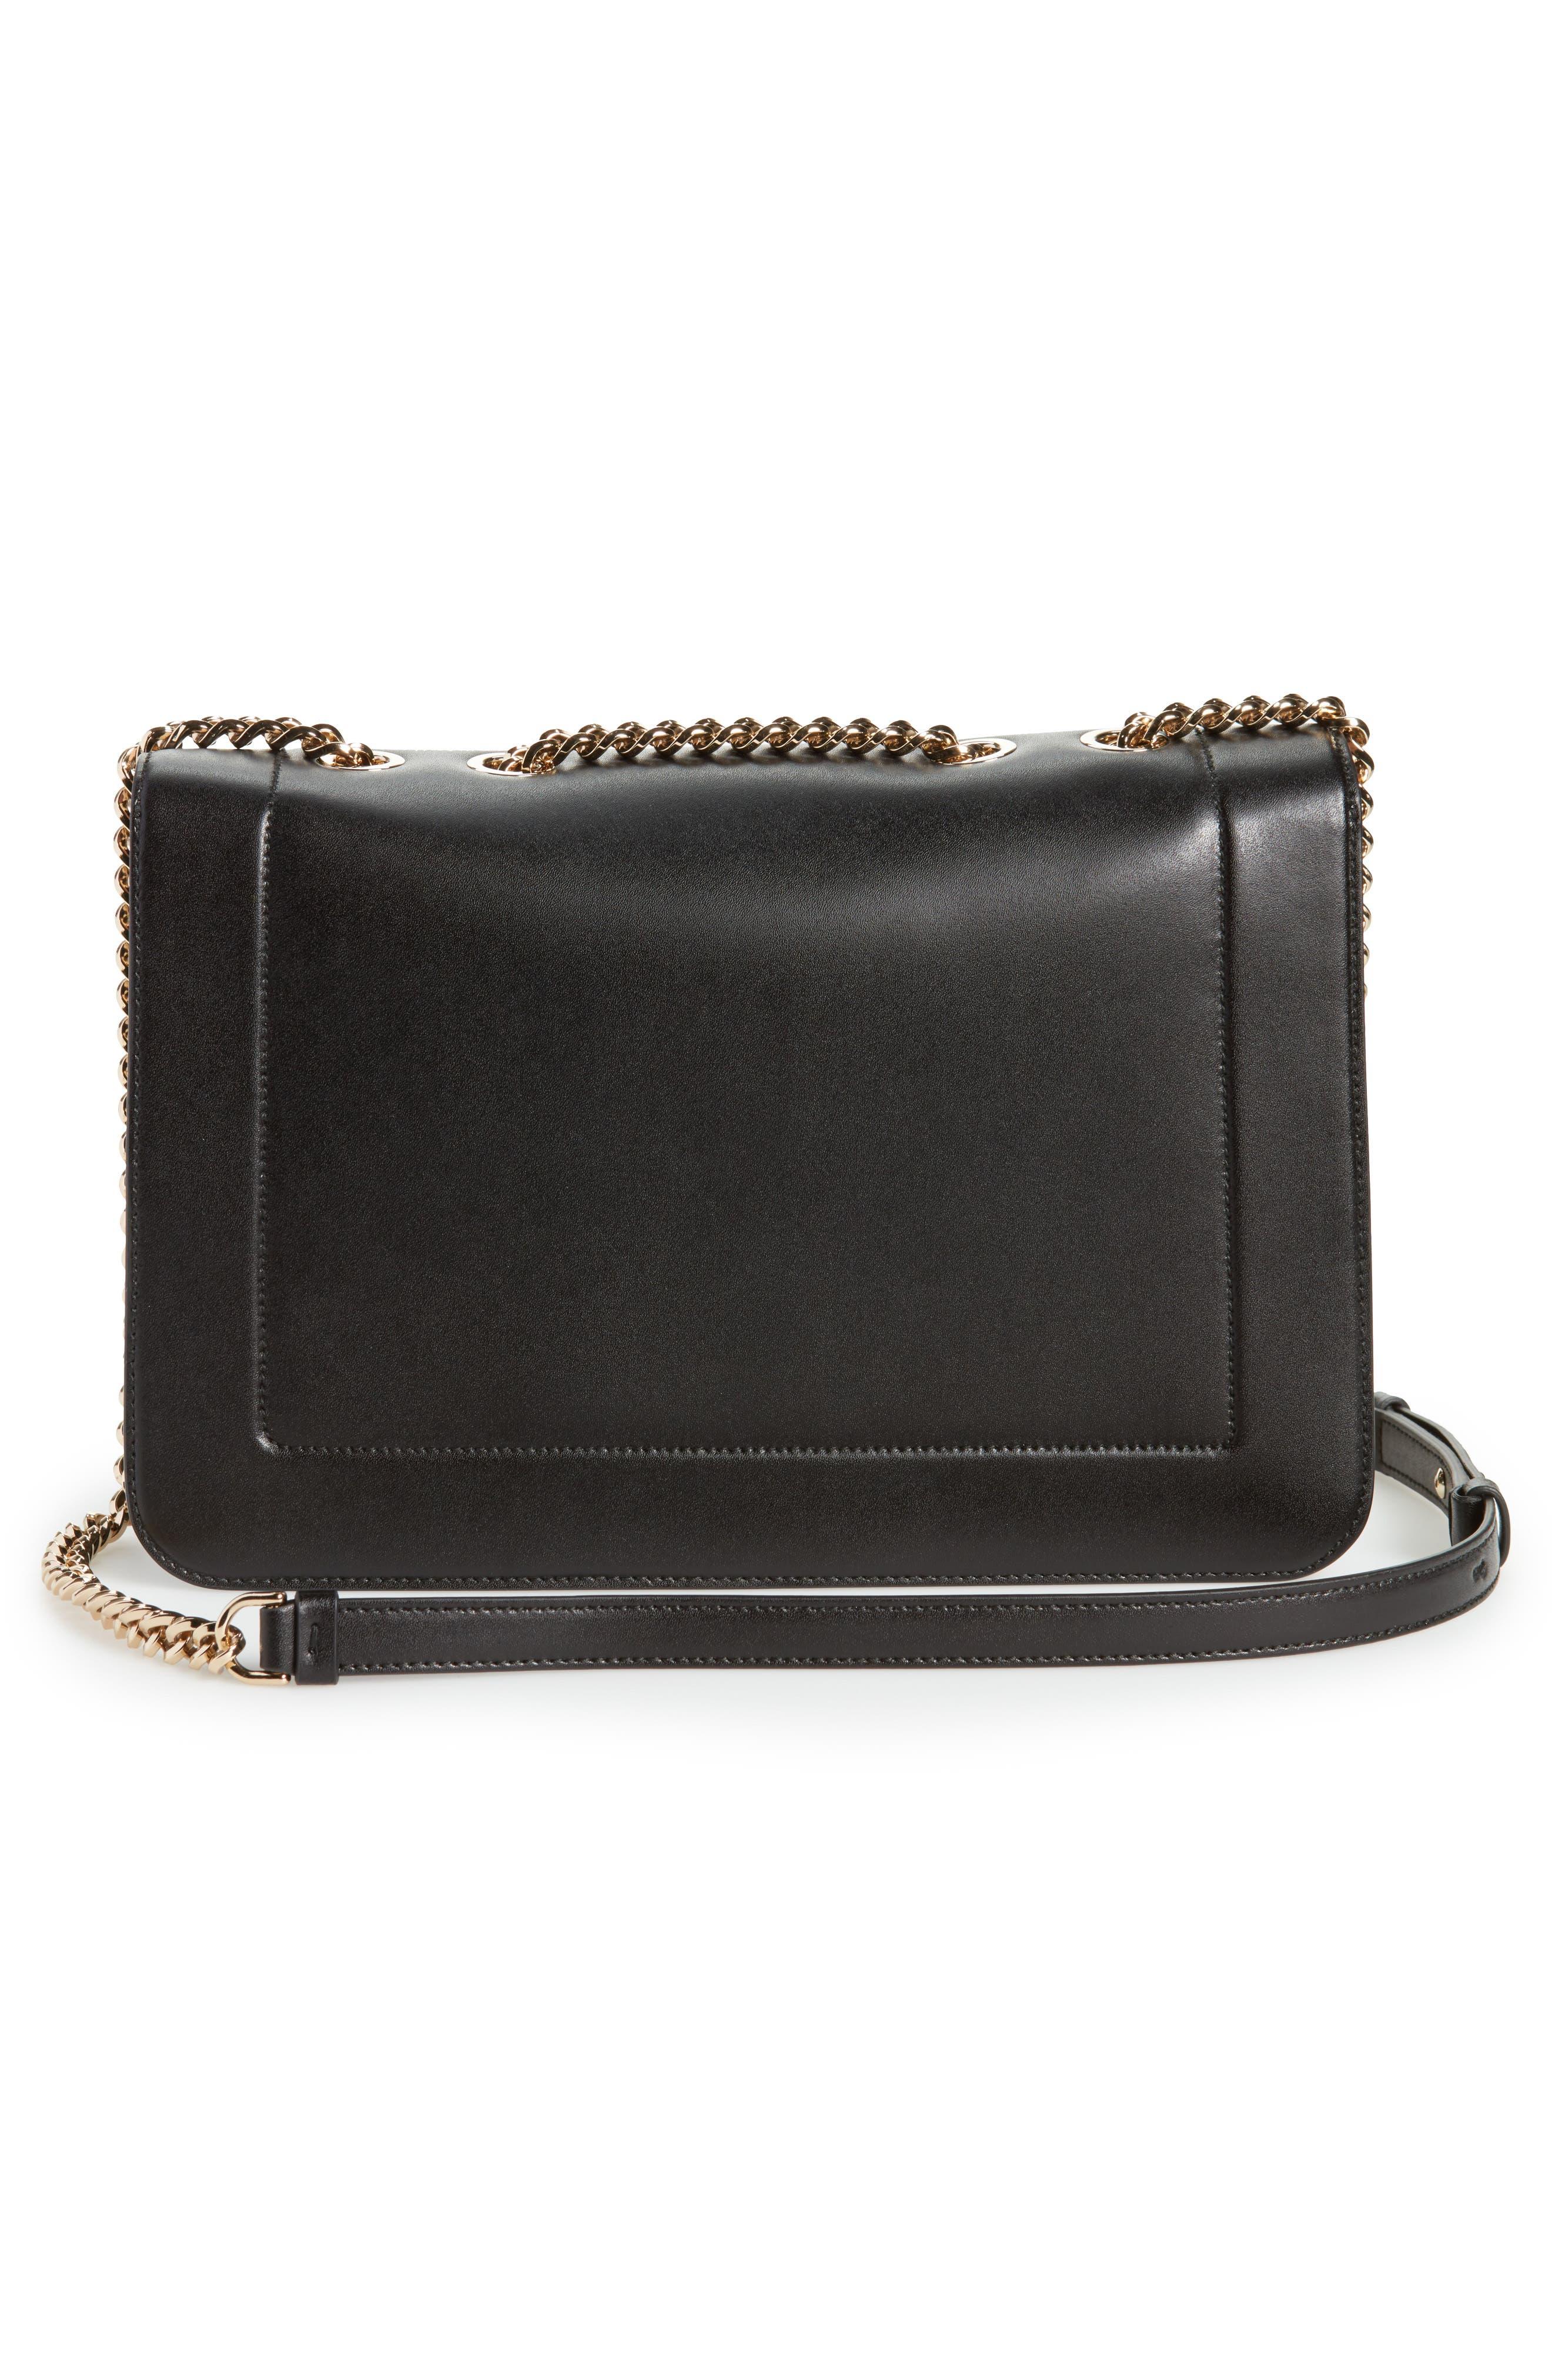 Vara Leather Shoulder Bag,                             Alternate thumbnail 3, color,                             Nero/ Bonbon